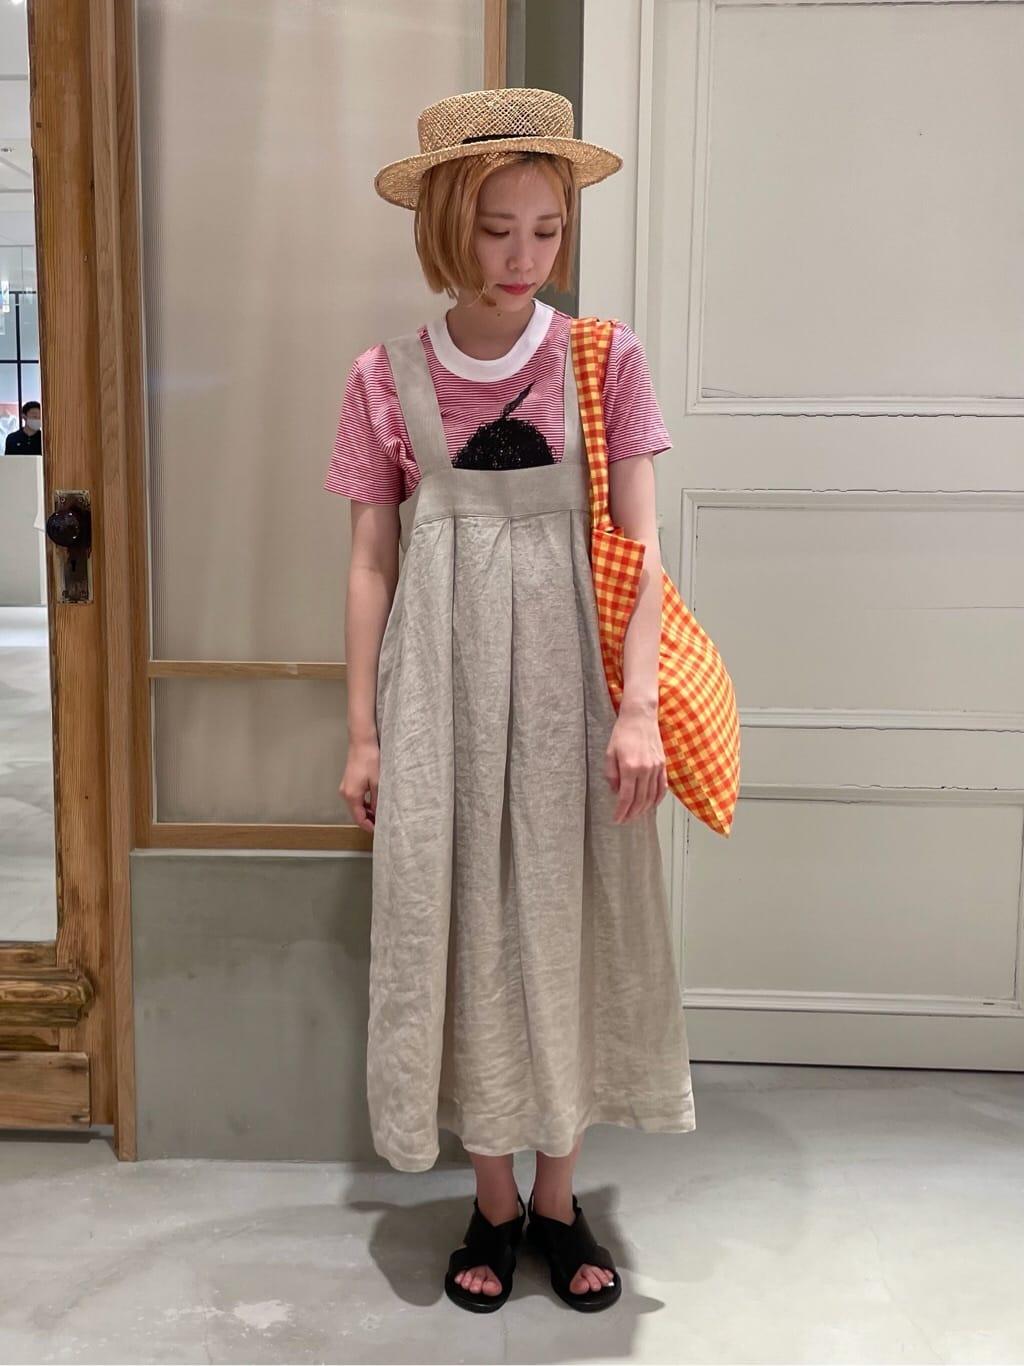 bulle de savon 渋谷スクランブルスクエア 身長:154cm 2021.07.27